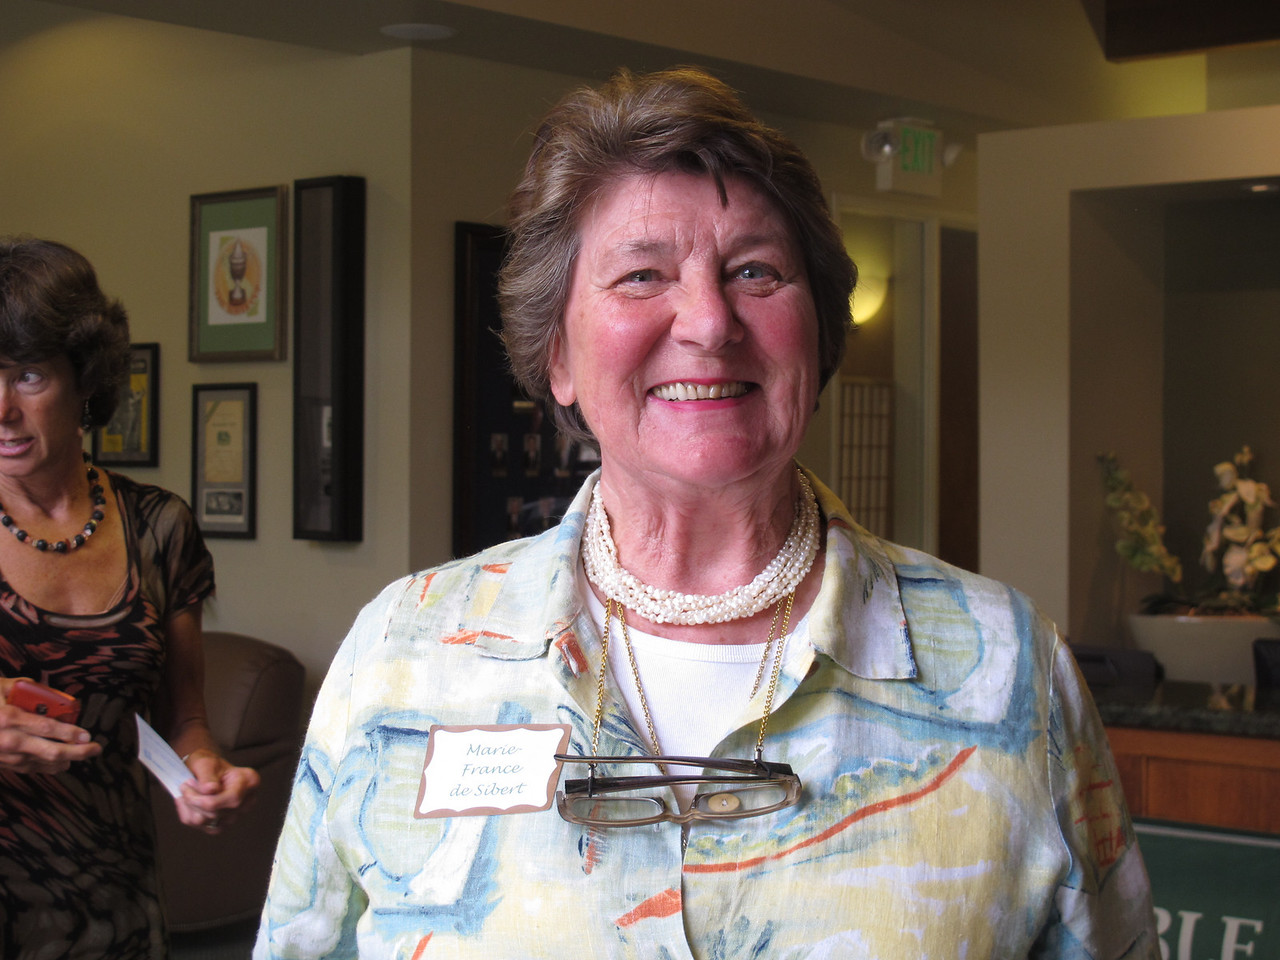 Marie-France de Sibert, PBRTA director '11-'12, gives us a smile